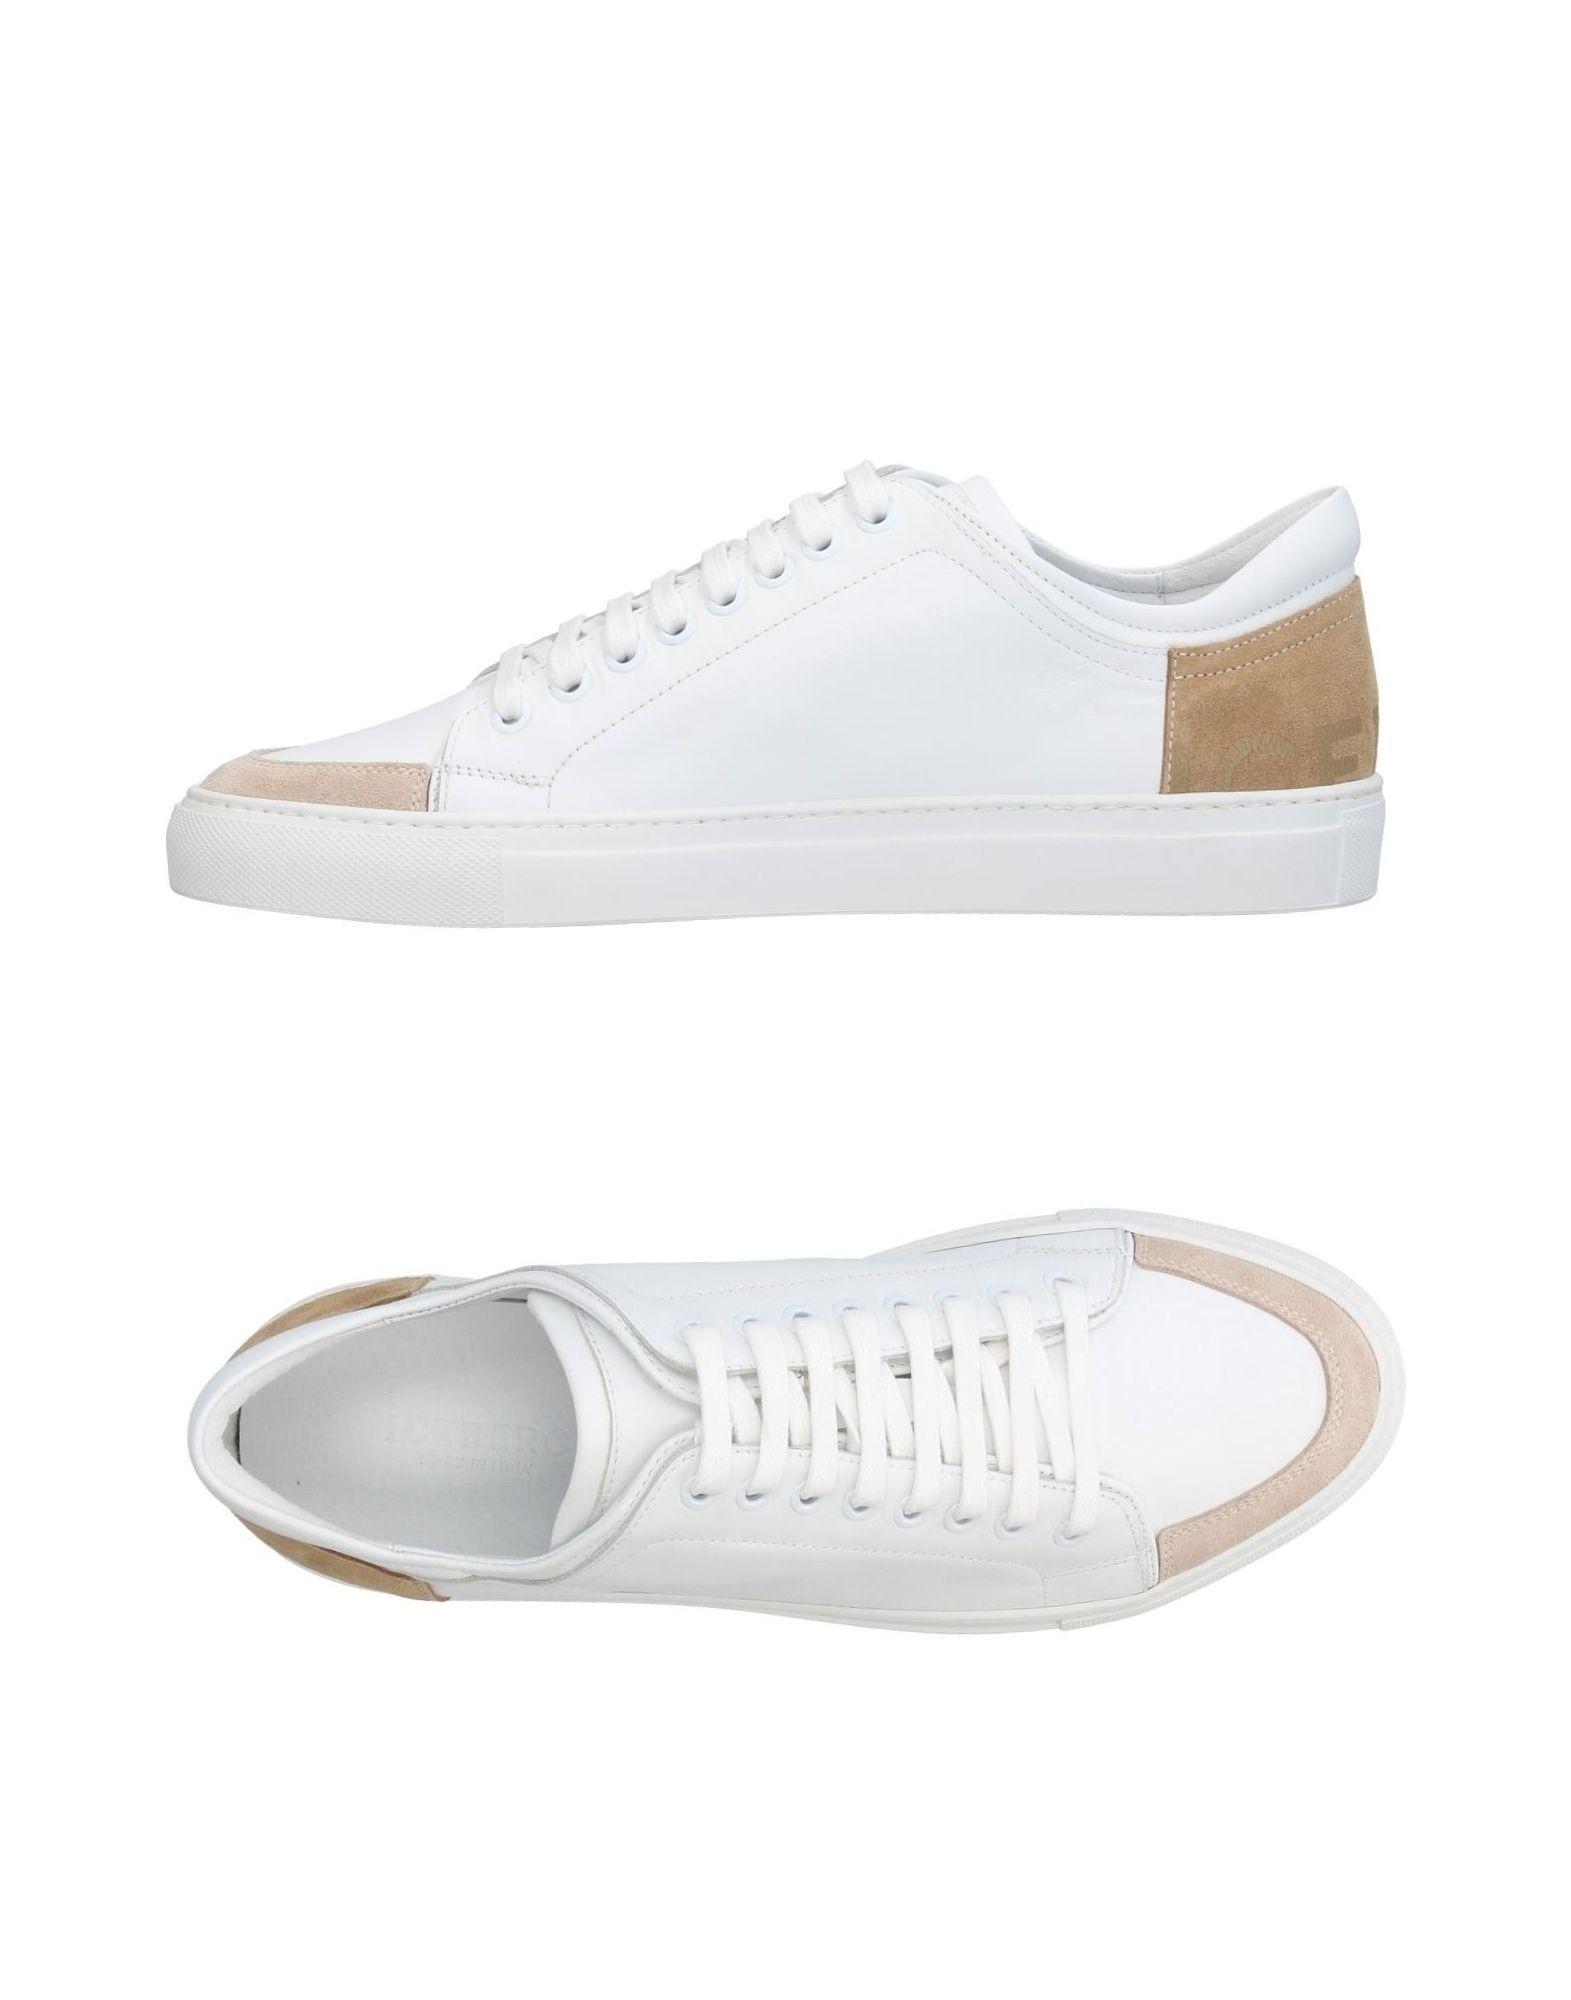 A buon mercato Sneakers Iceberg Uomo - 11406194DR